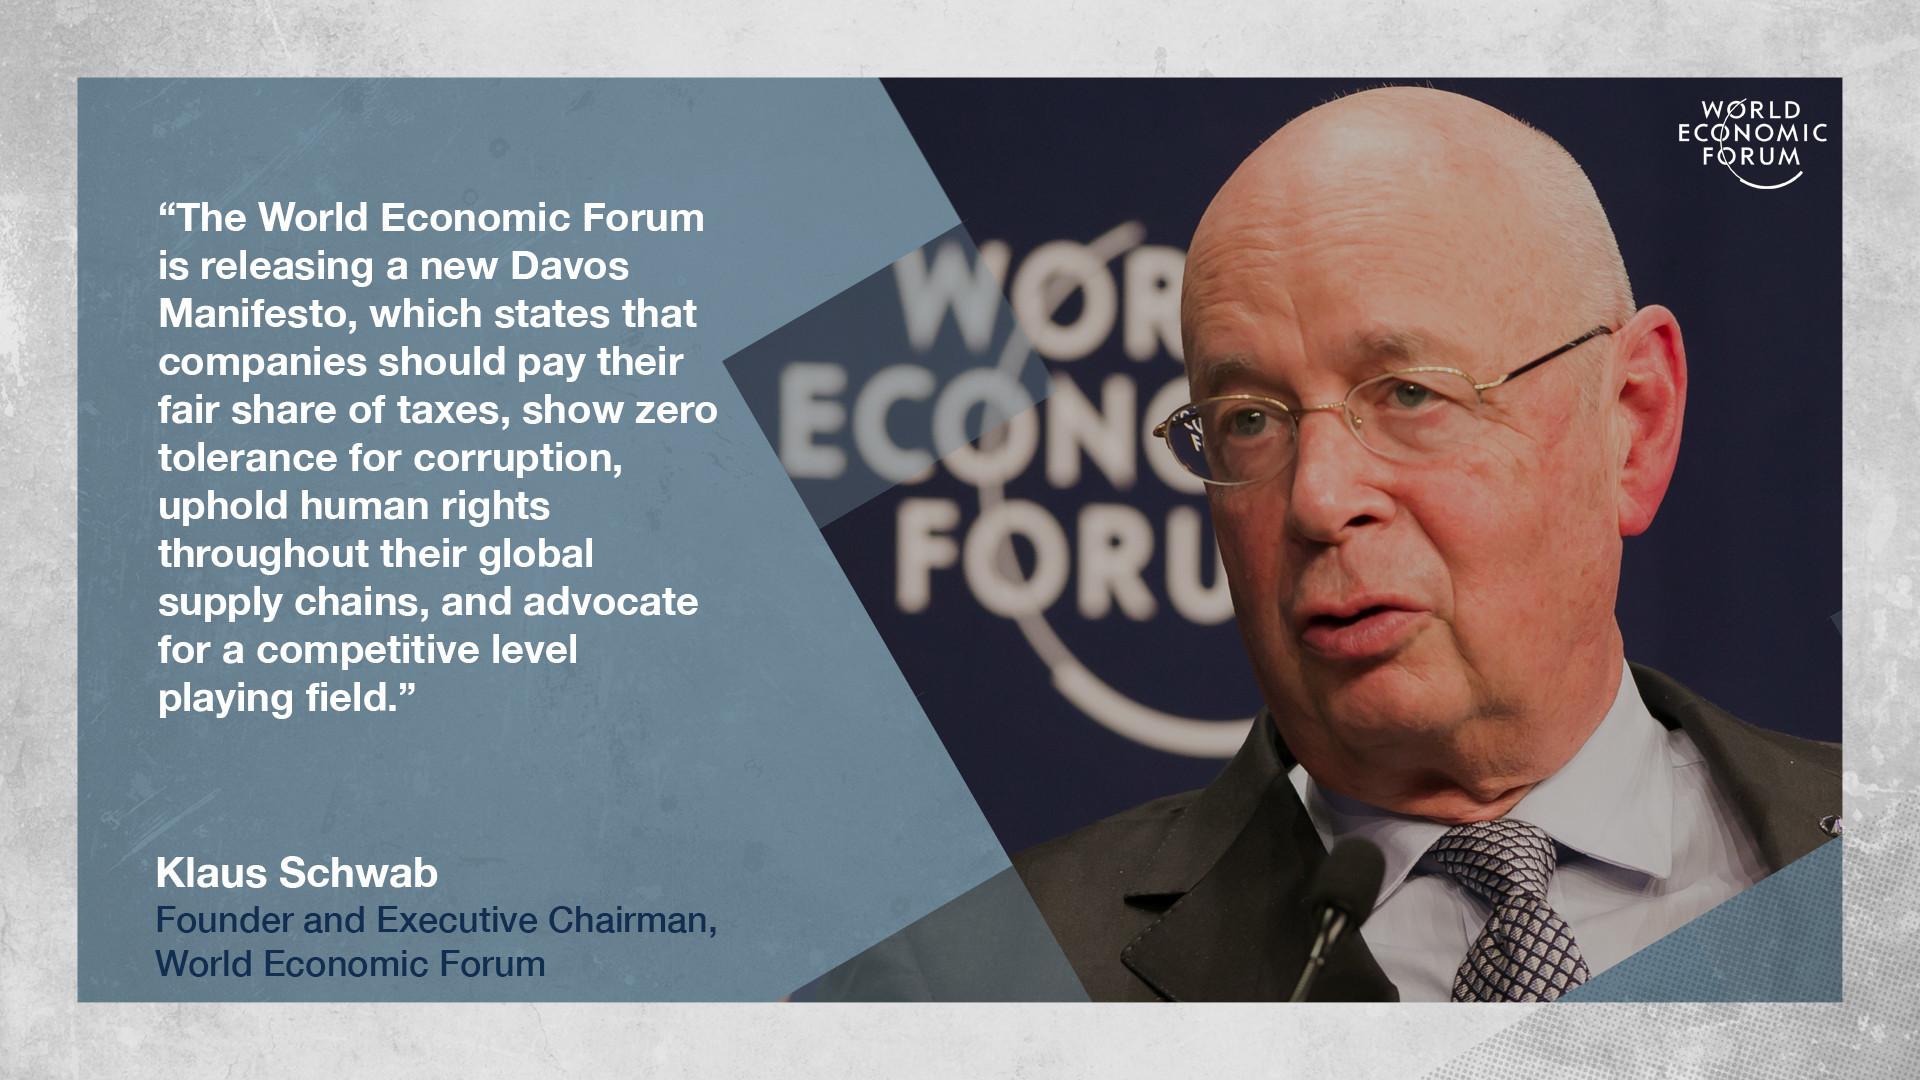 Davos World Economic Forum Klaus Schwab